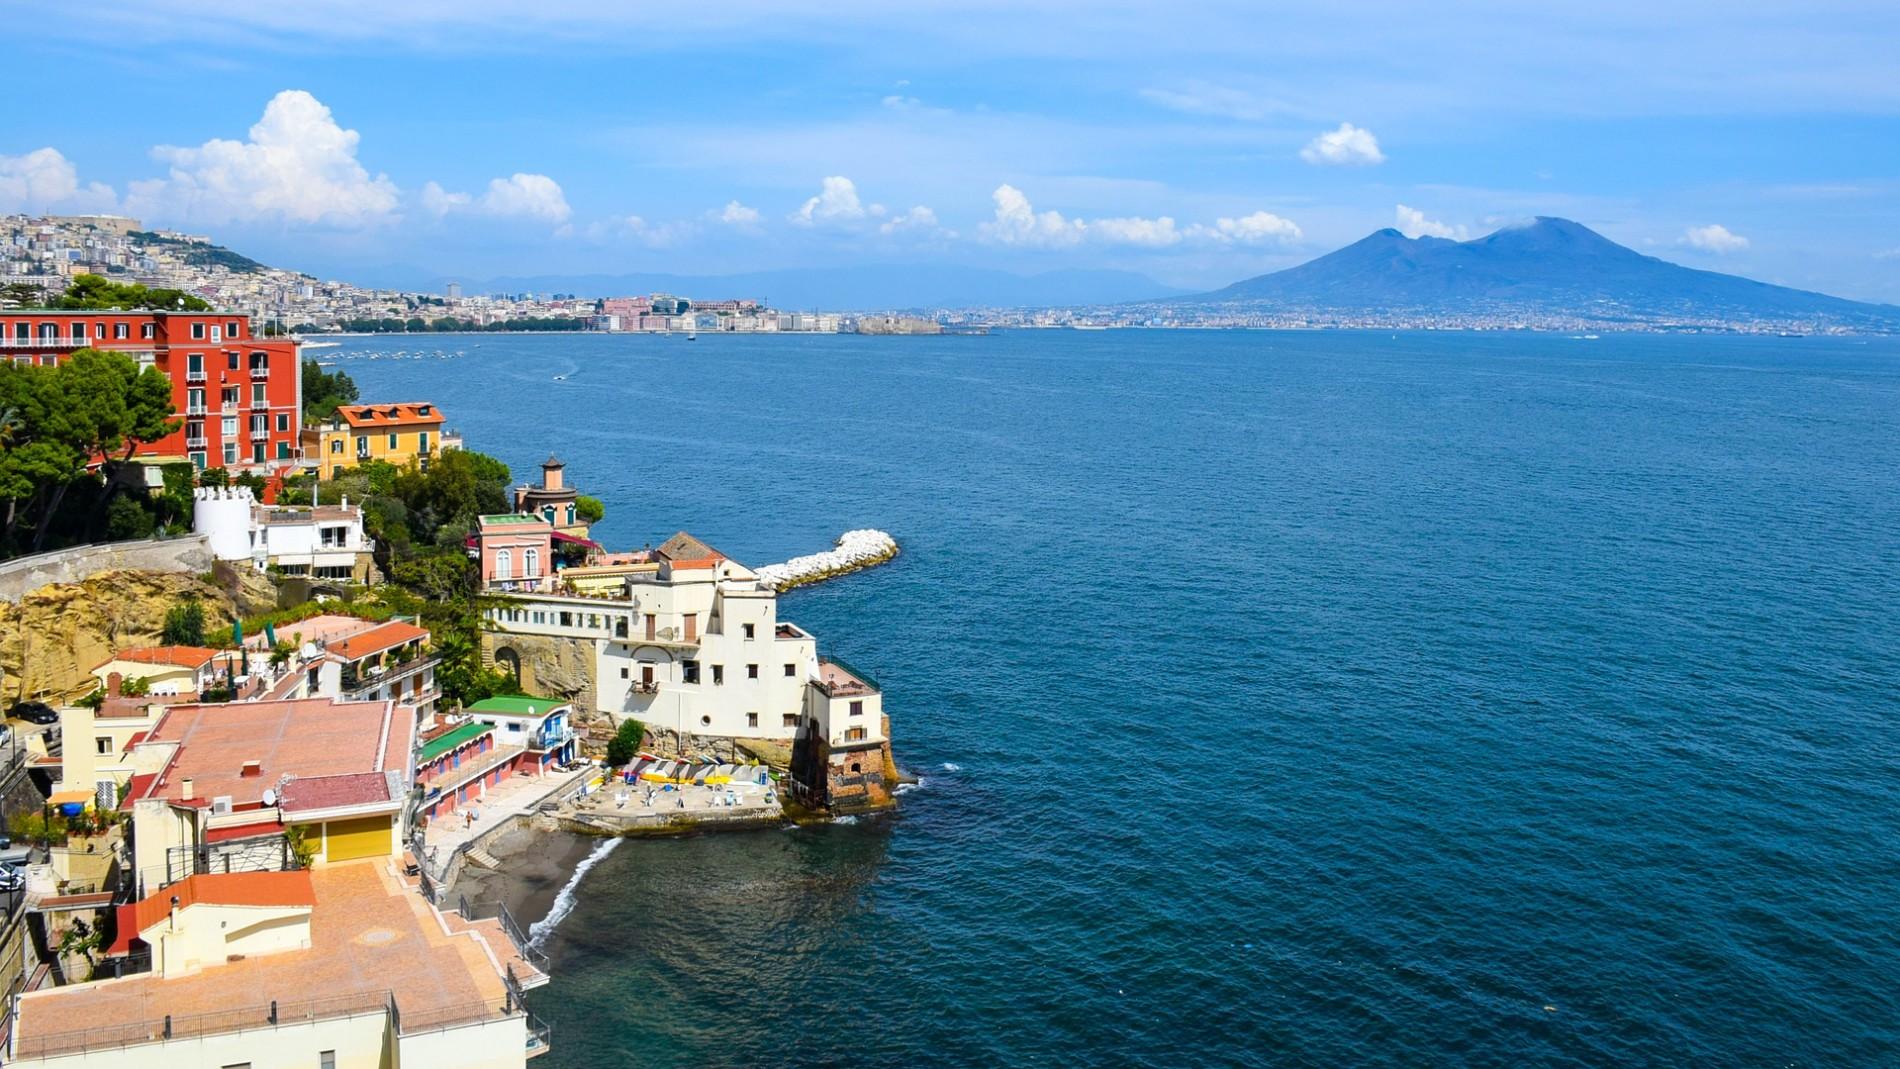 ENTFÄLLT Sorrent - Golf von Neapel/Amalfiküste 2021 - Union Reiseteam